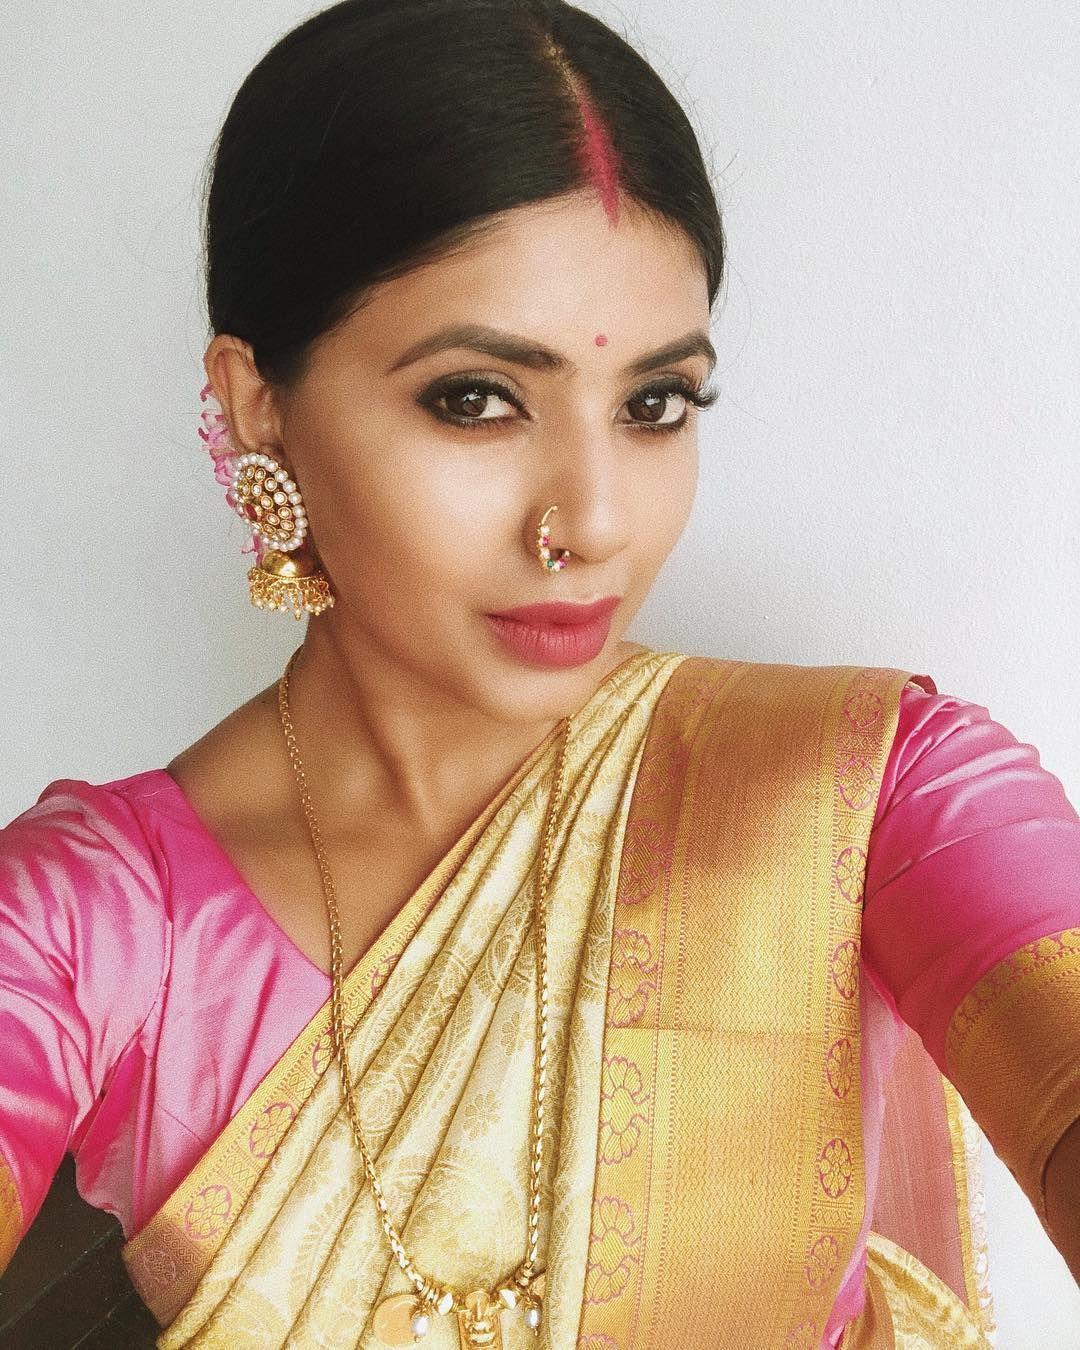 Wedding Hairstyle In Sri Lanka: A Traditional Wedding In